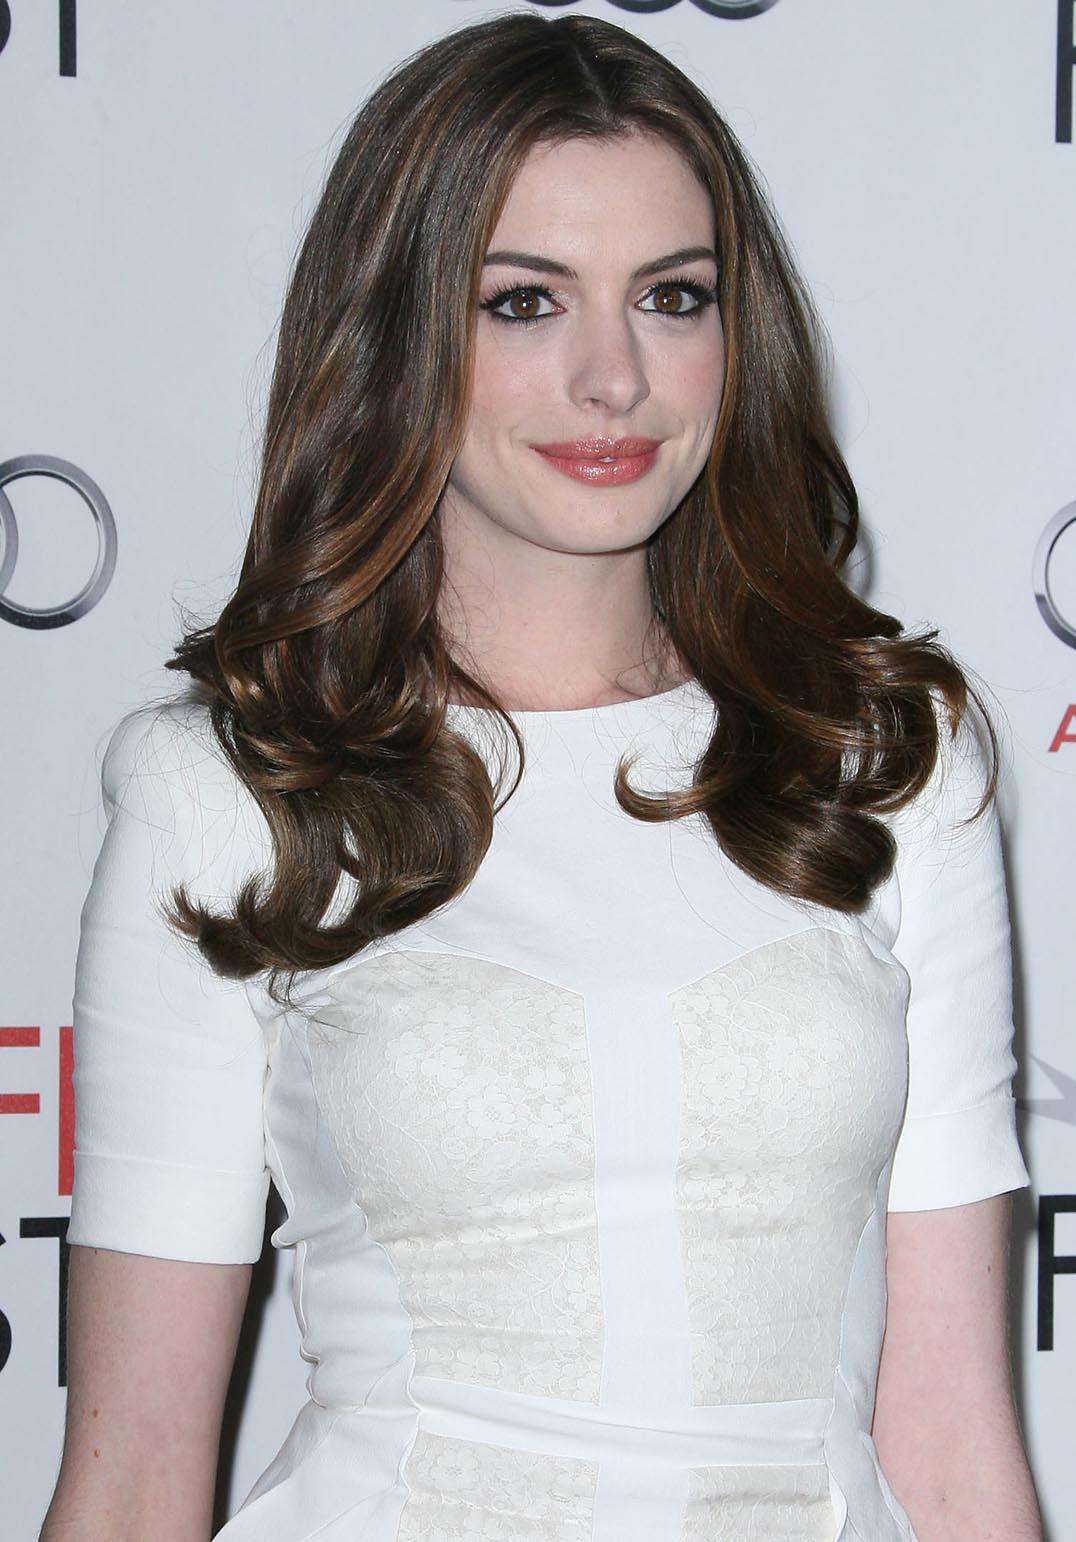 http://1.bp.blogspot.com/_FzLeCtJarvU/TNgN6c4d06I/AAAAAAAAEnk/z_oIaiPAqaw/s1600/anne_hathaway_white_dress.jpg